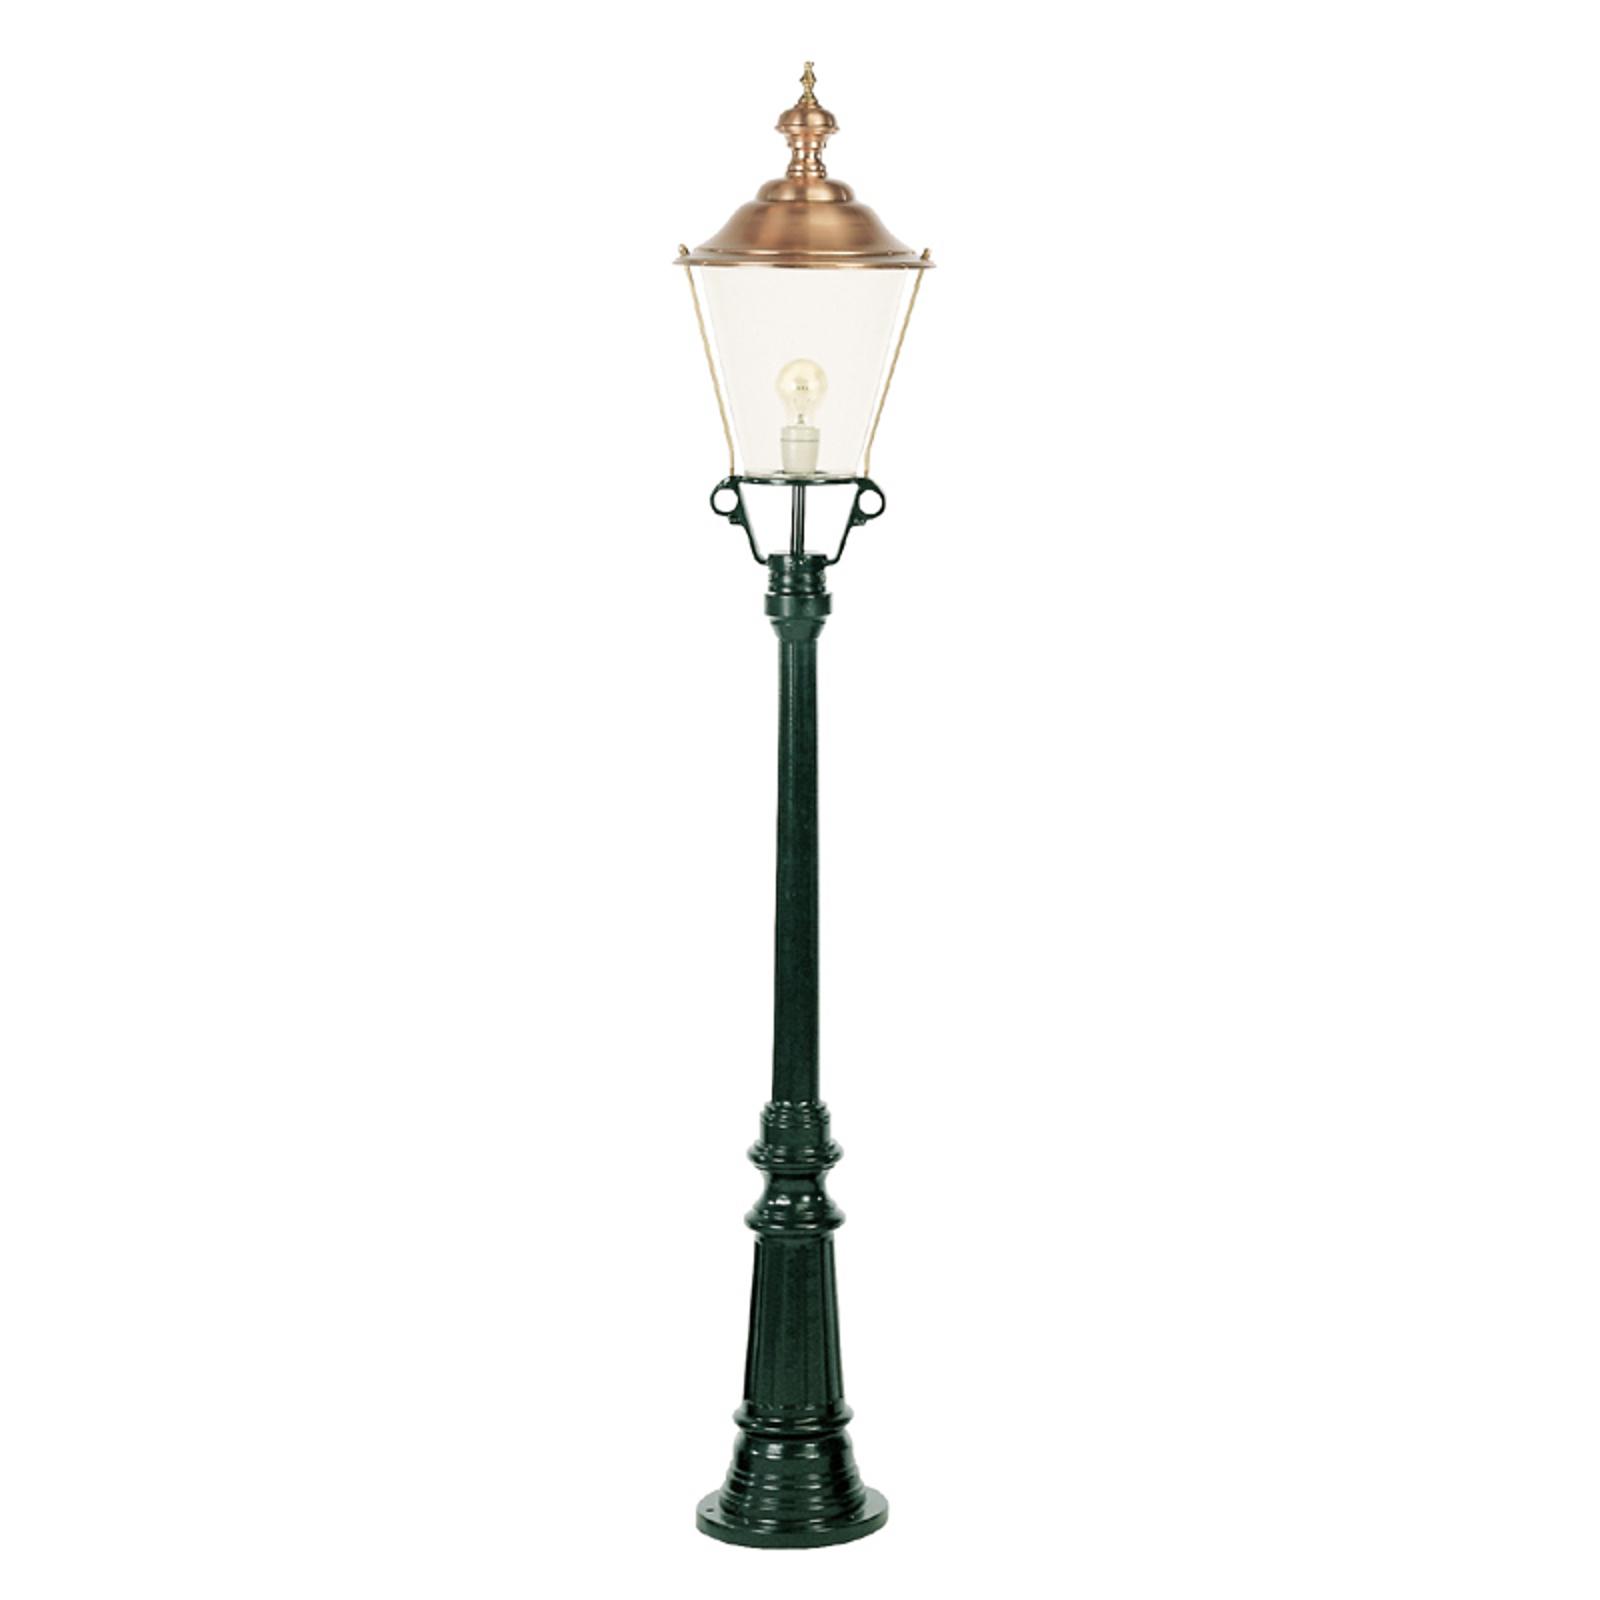 Atrakcyjna latarnia Flores, zielona